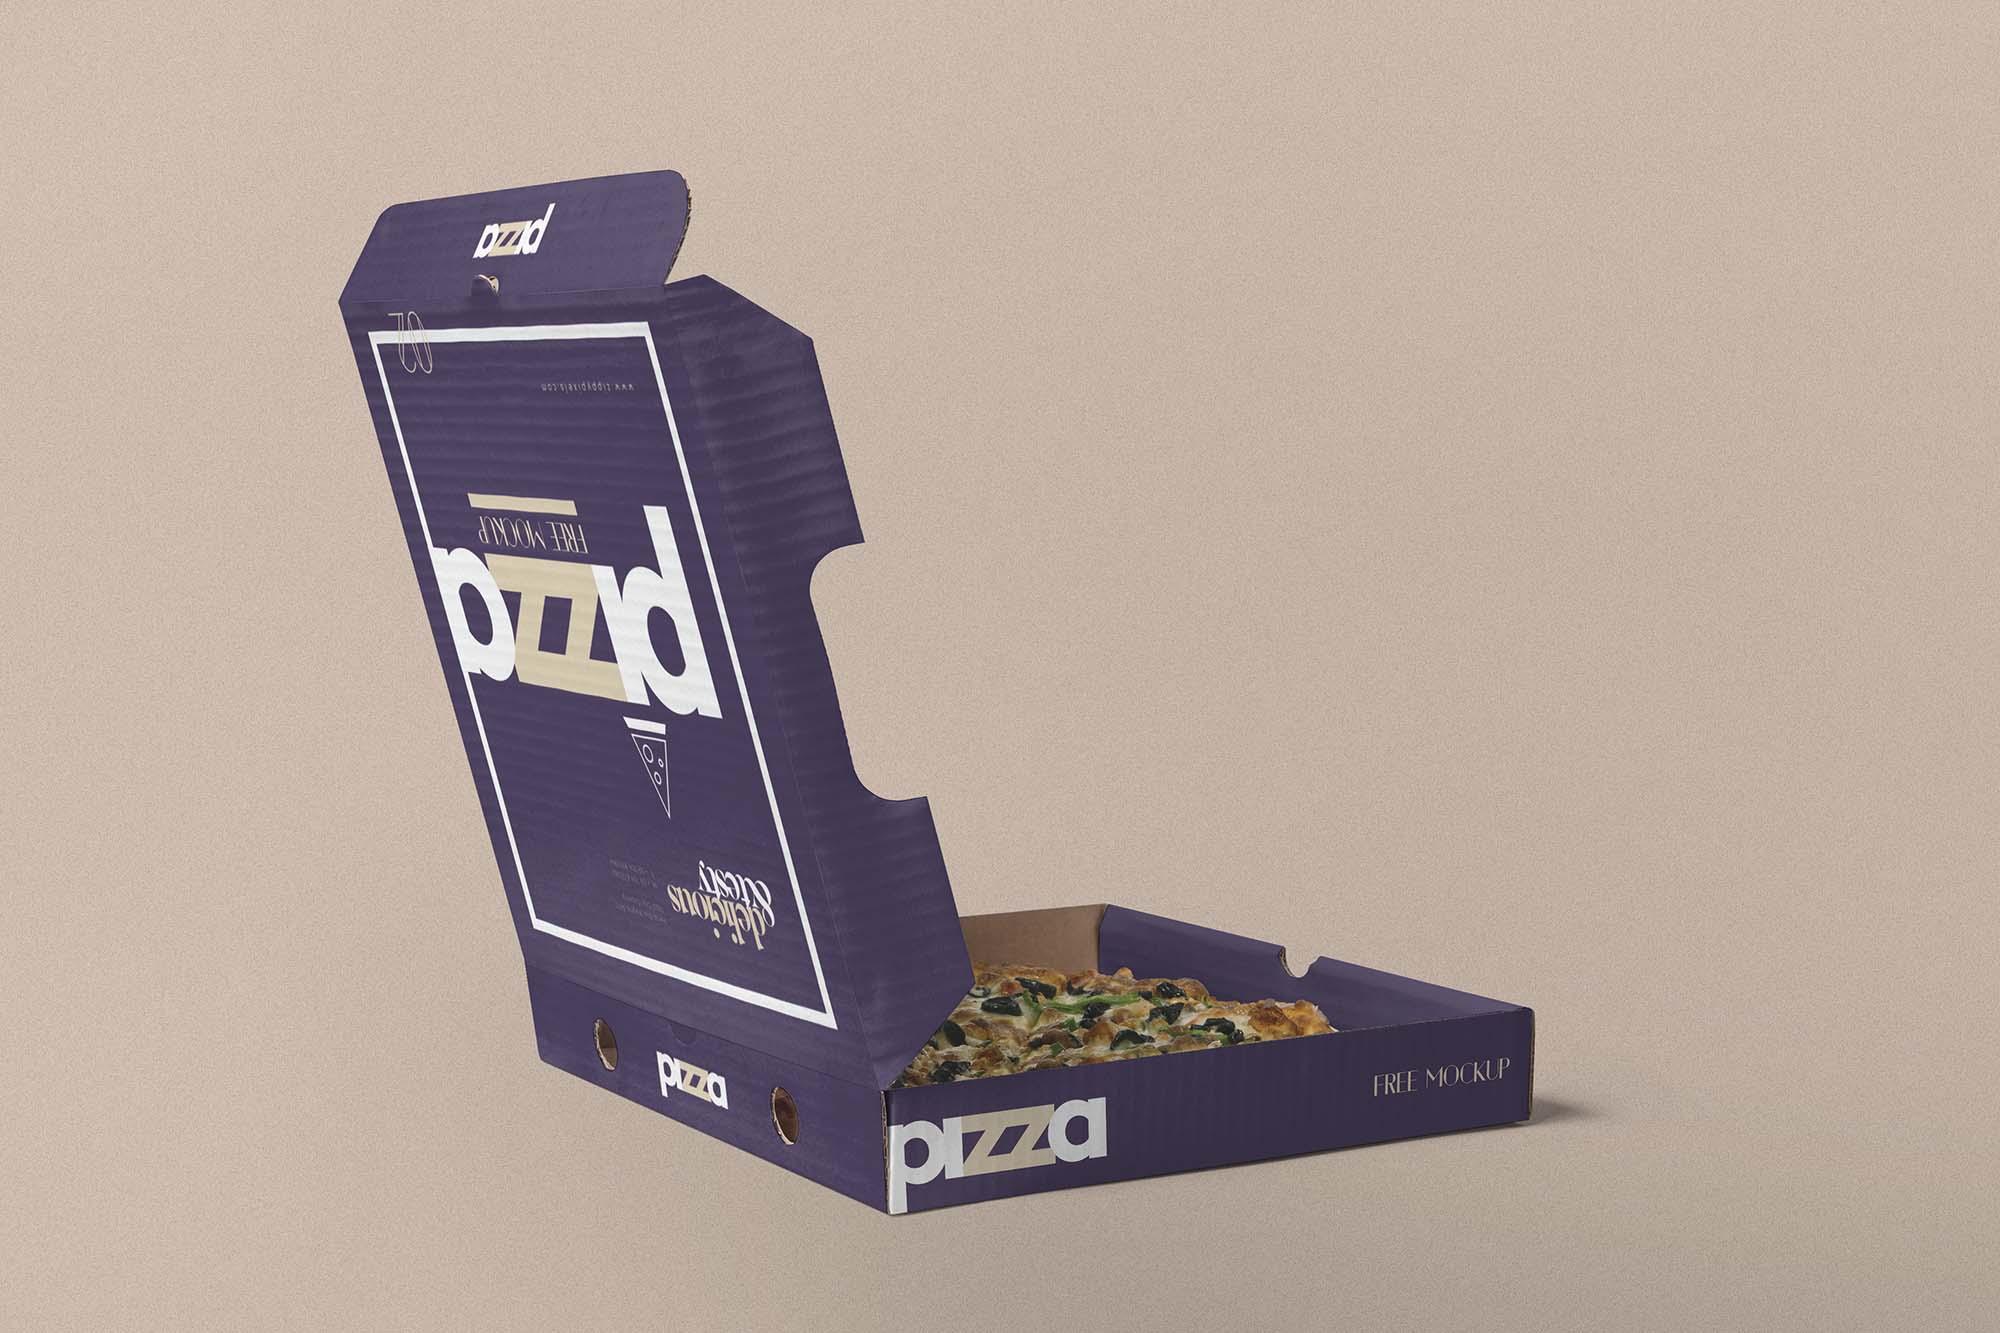 Opened Pizza Box Mockup